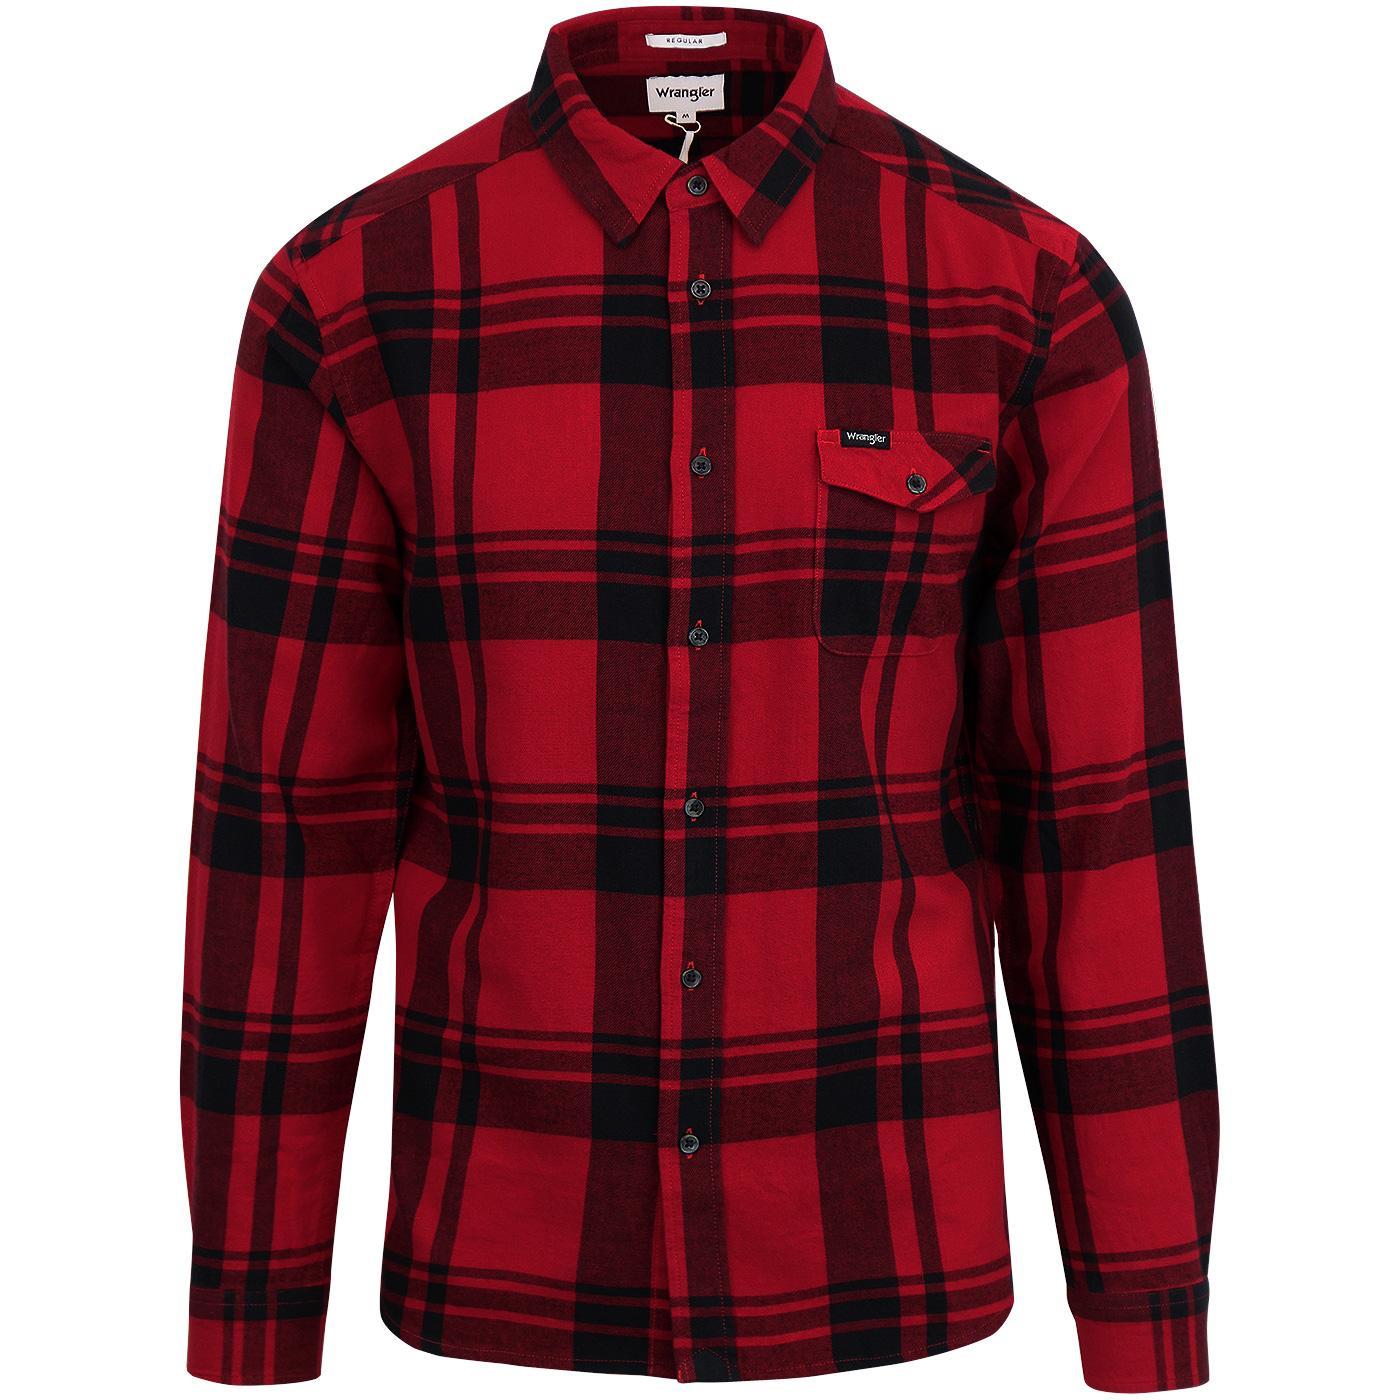 WRANGLER Retro Mod 1 Pocket Lumberjack Check Shirt